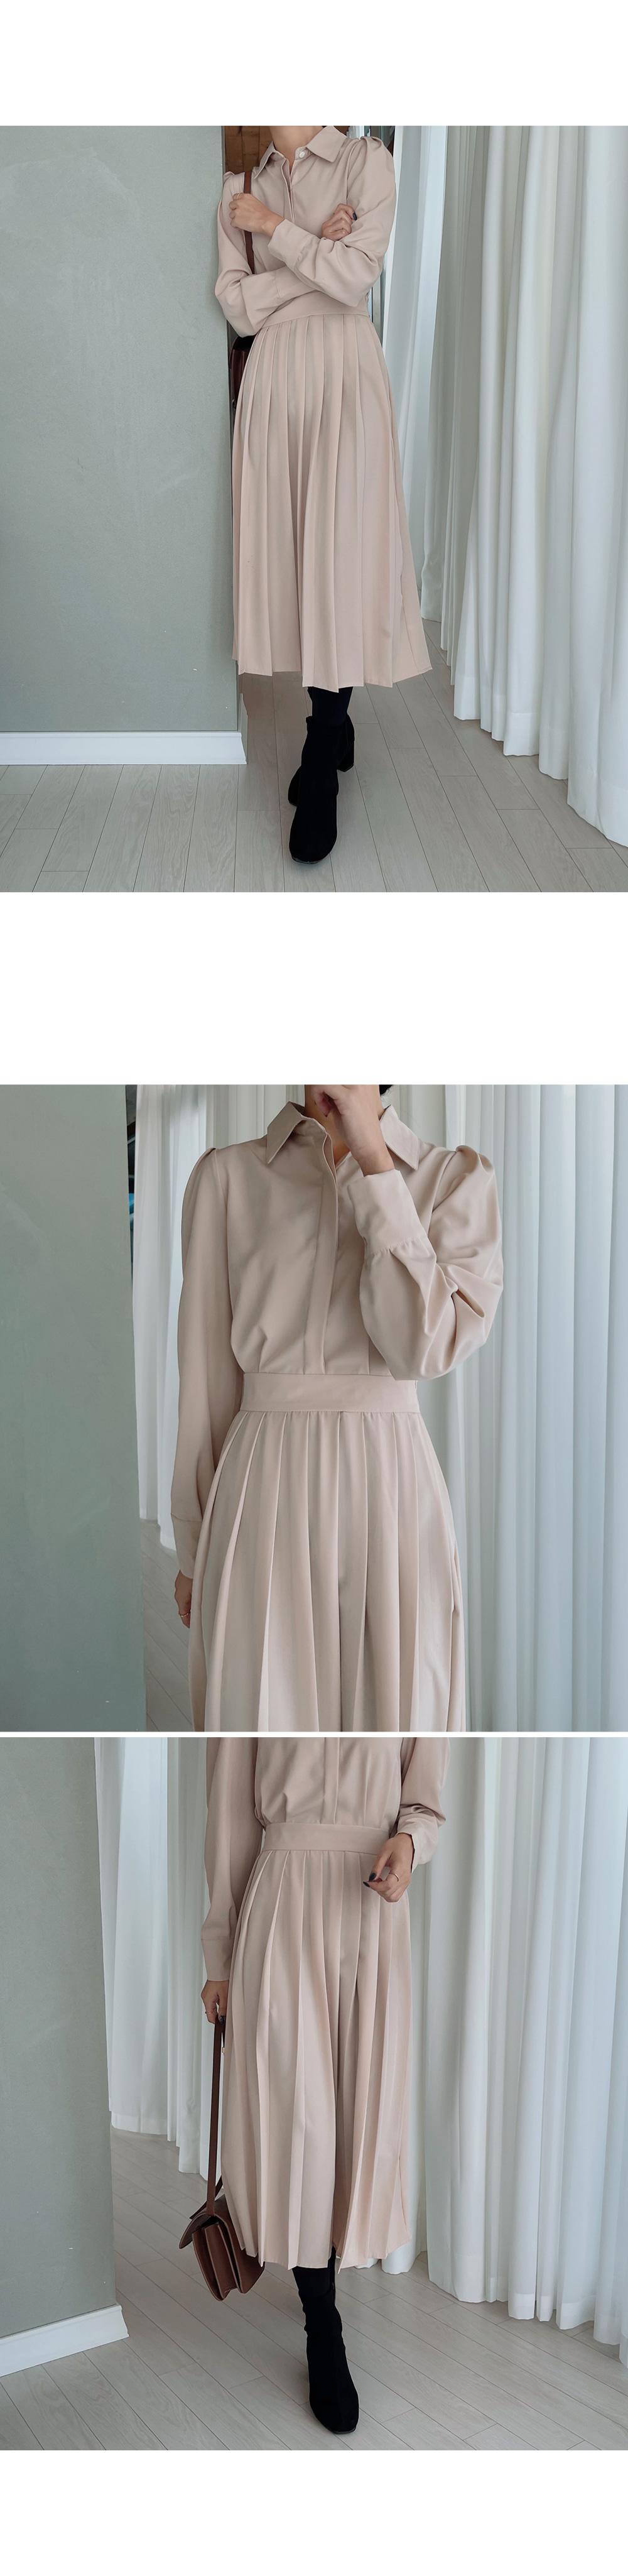 Shirt Pleats Long Dress-holiholic.com